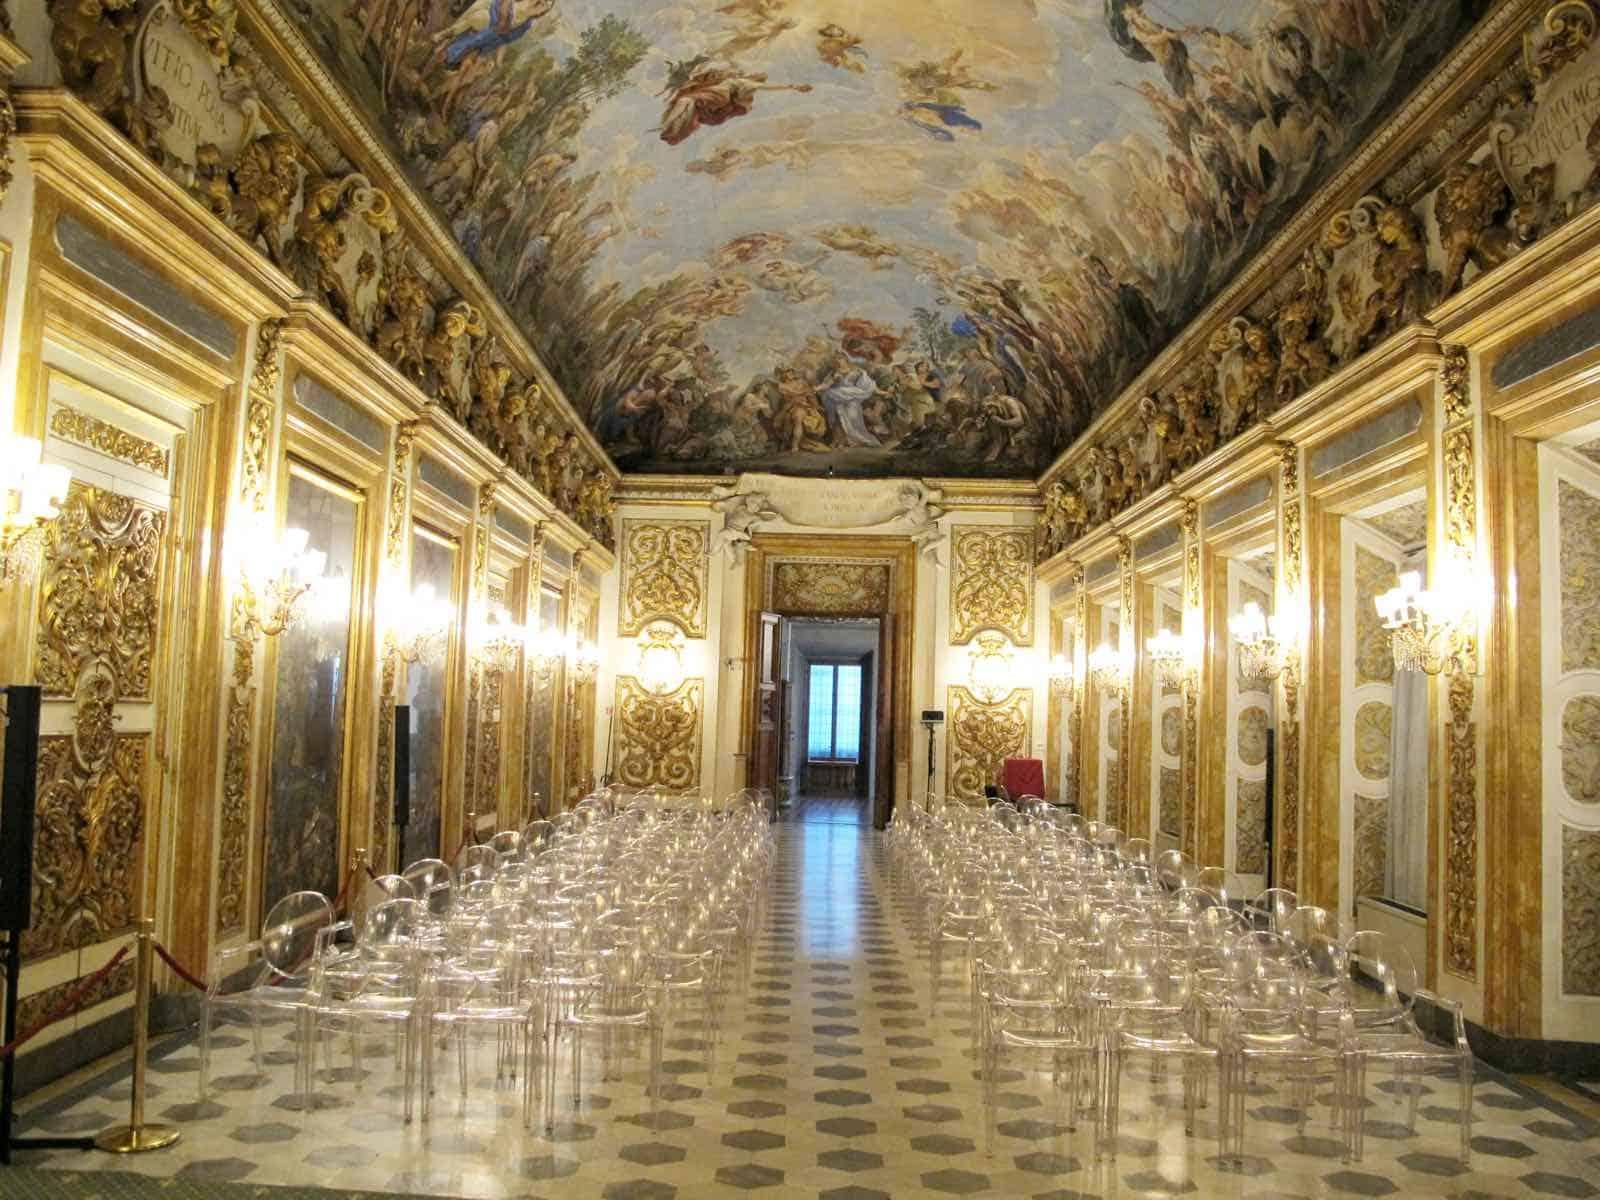 Italien - Firenze - Palazzo medici